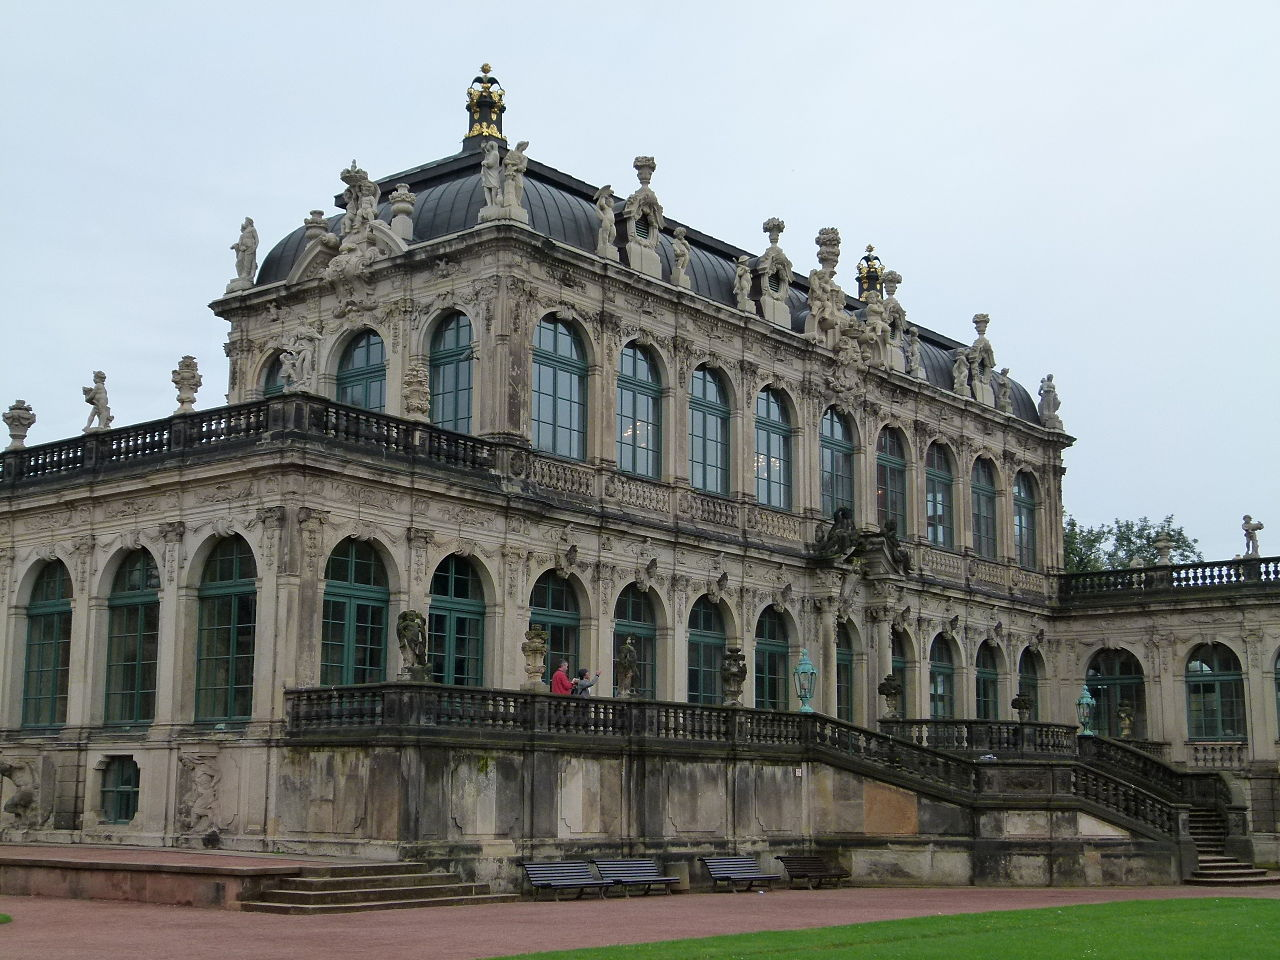 Цвингер, Музей фарфора в Дрездене